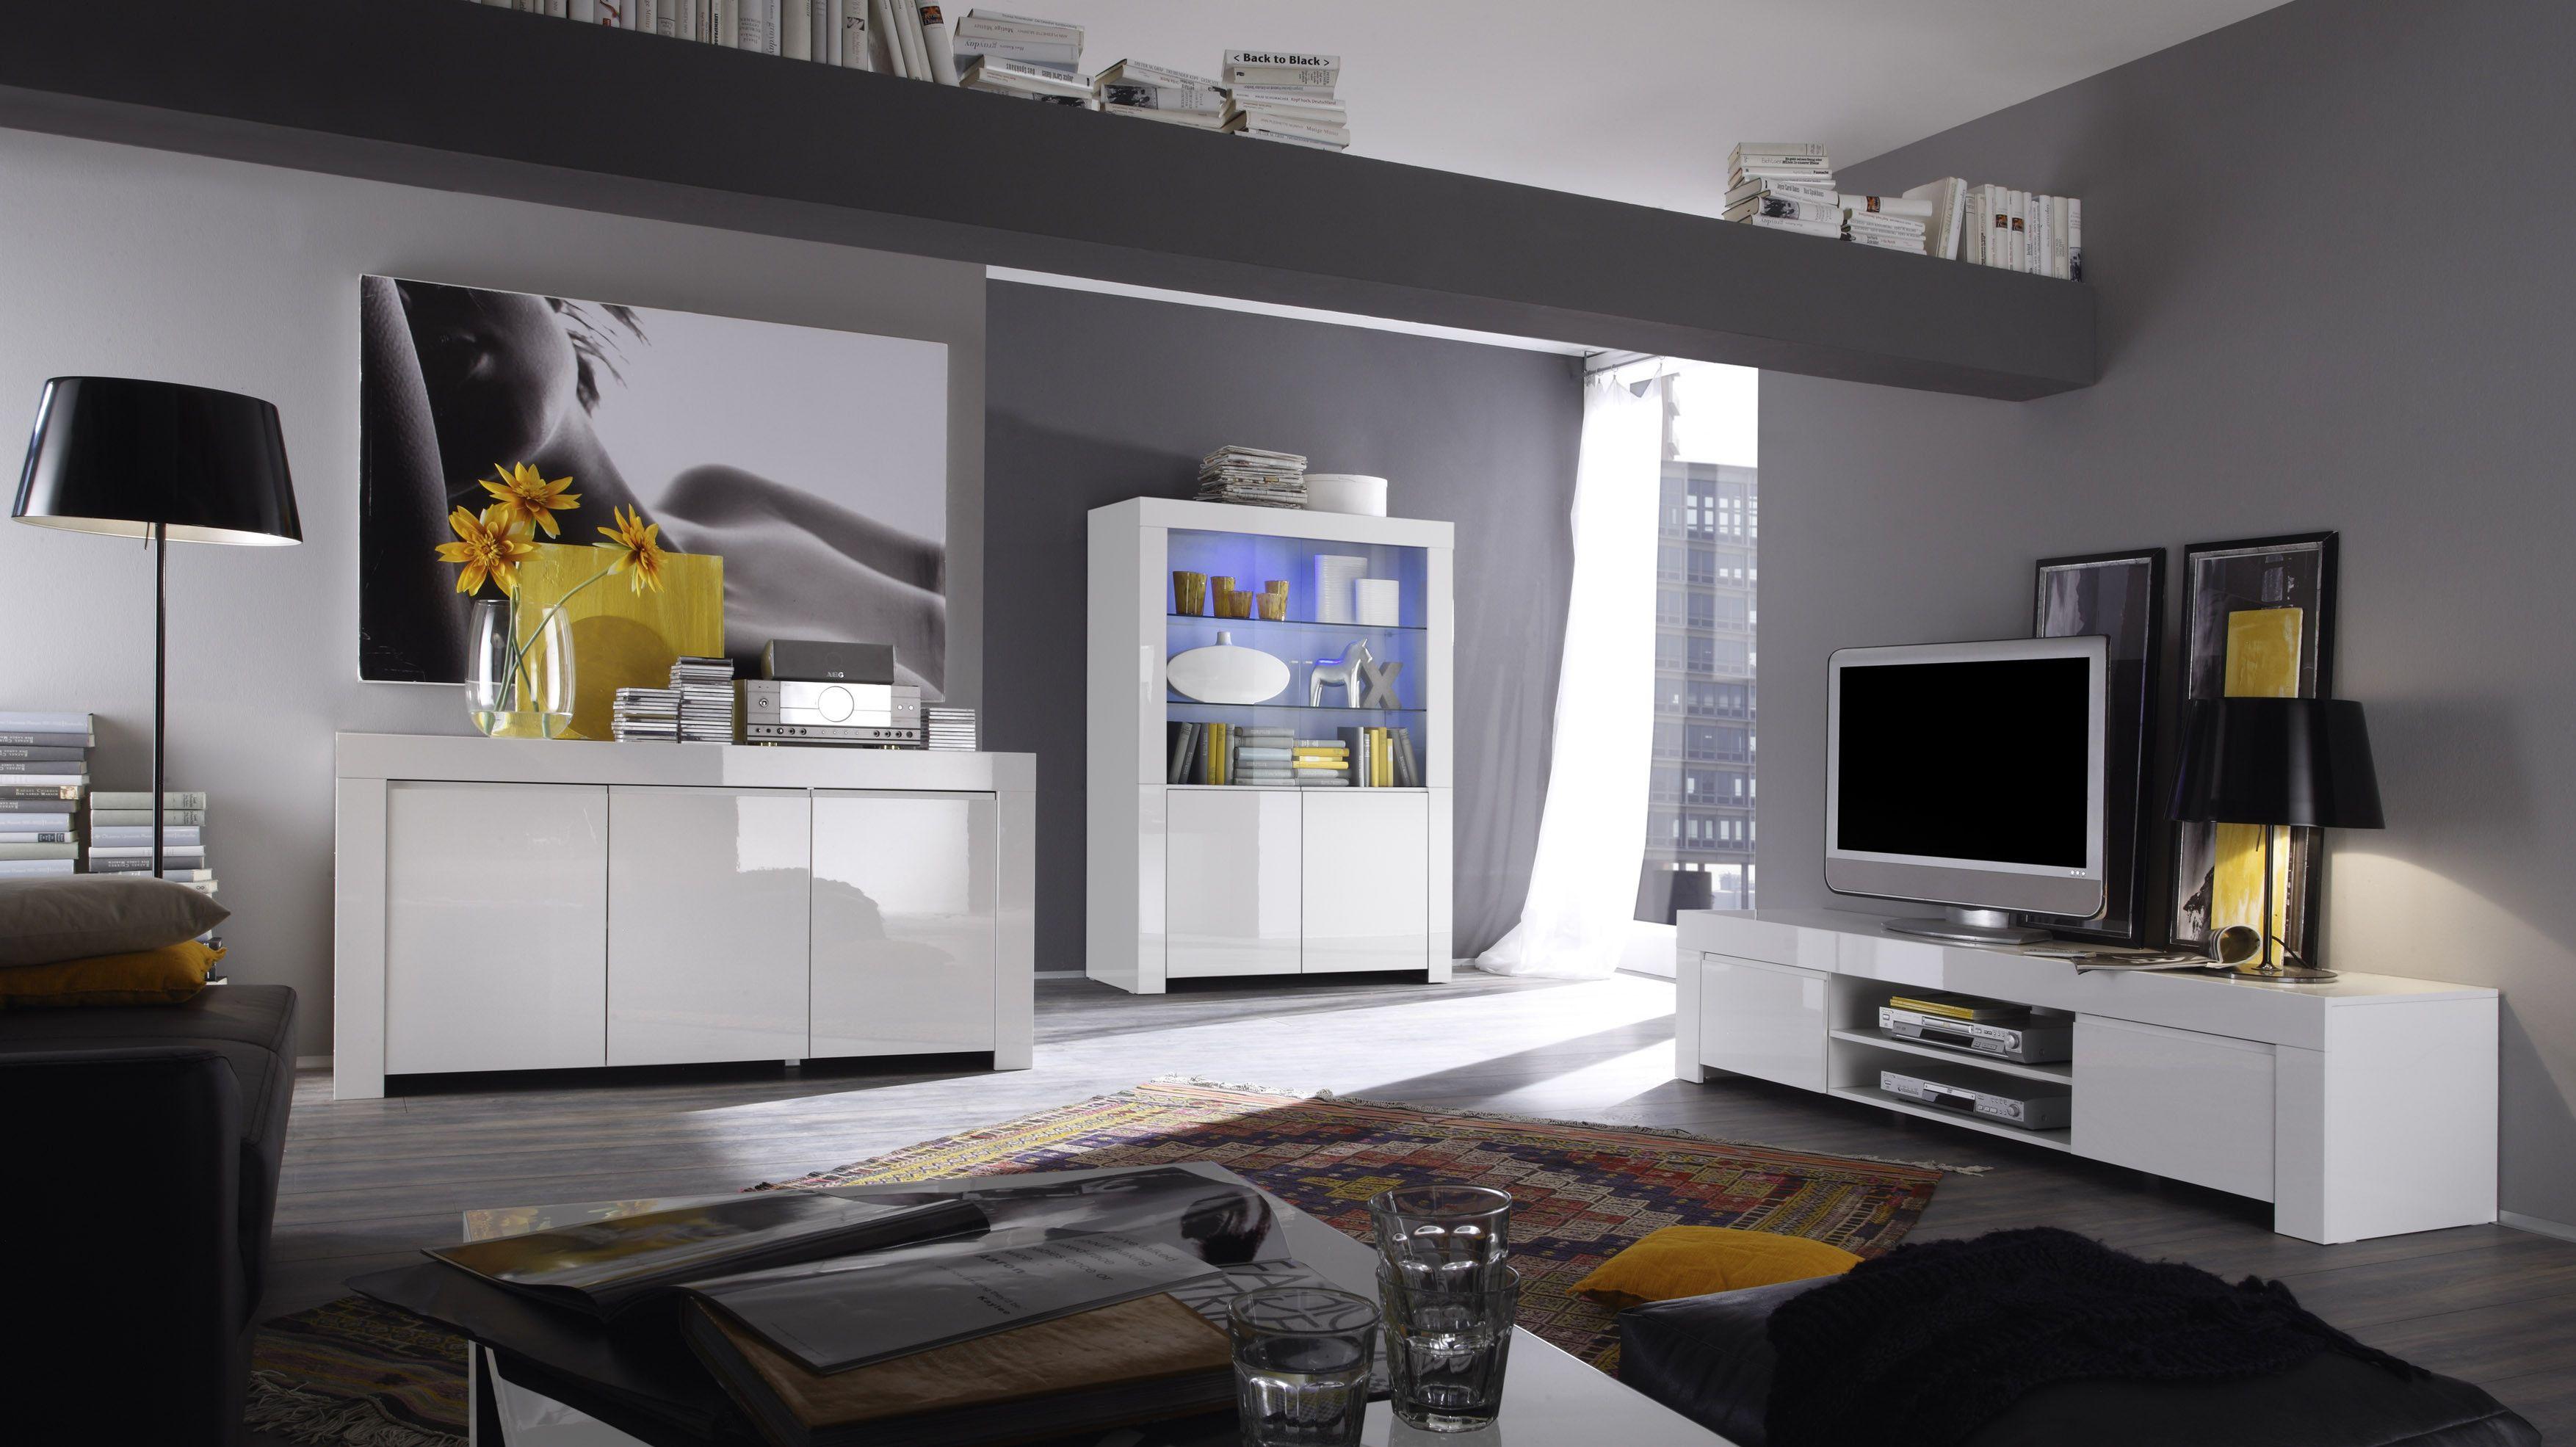 Wohnzimmer Weiss Echt Hochglanz Lackiert Woody 12 00882 Modern Jetzt  Bestellen Unter: Https: